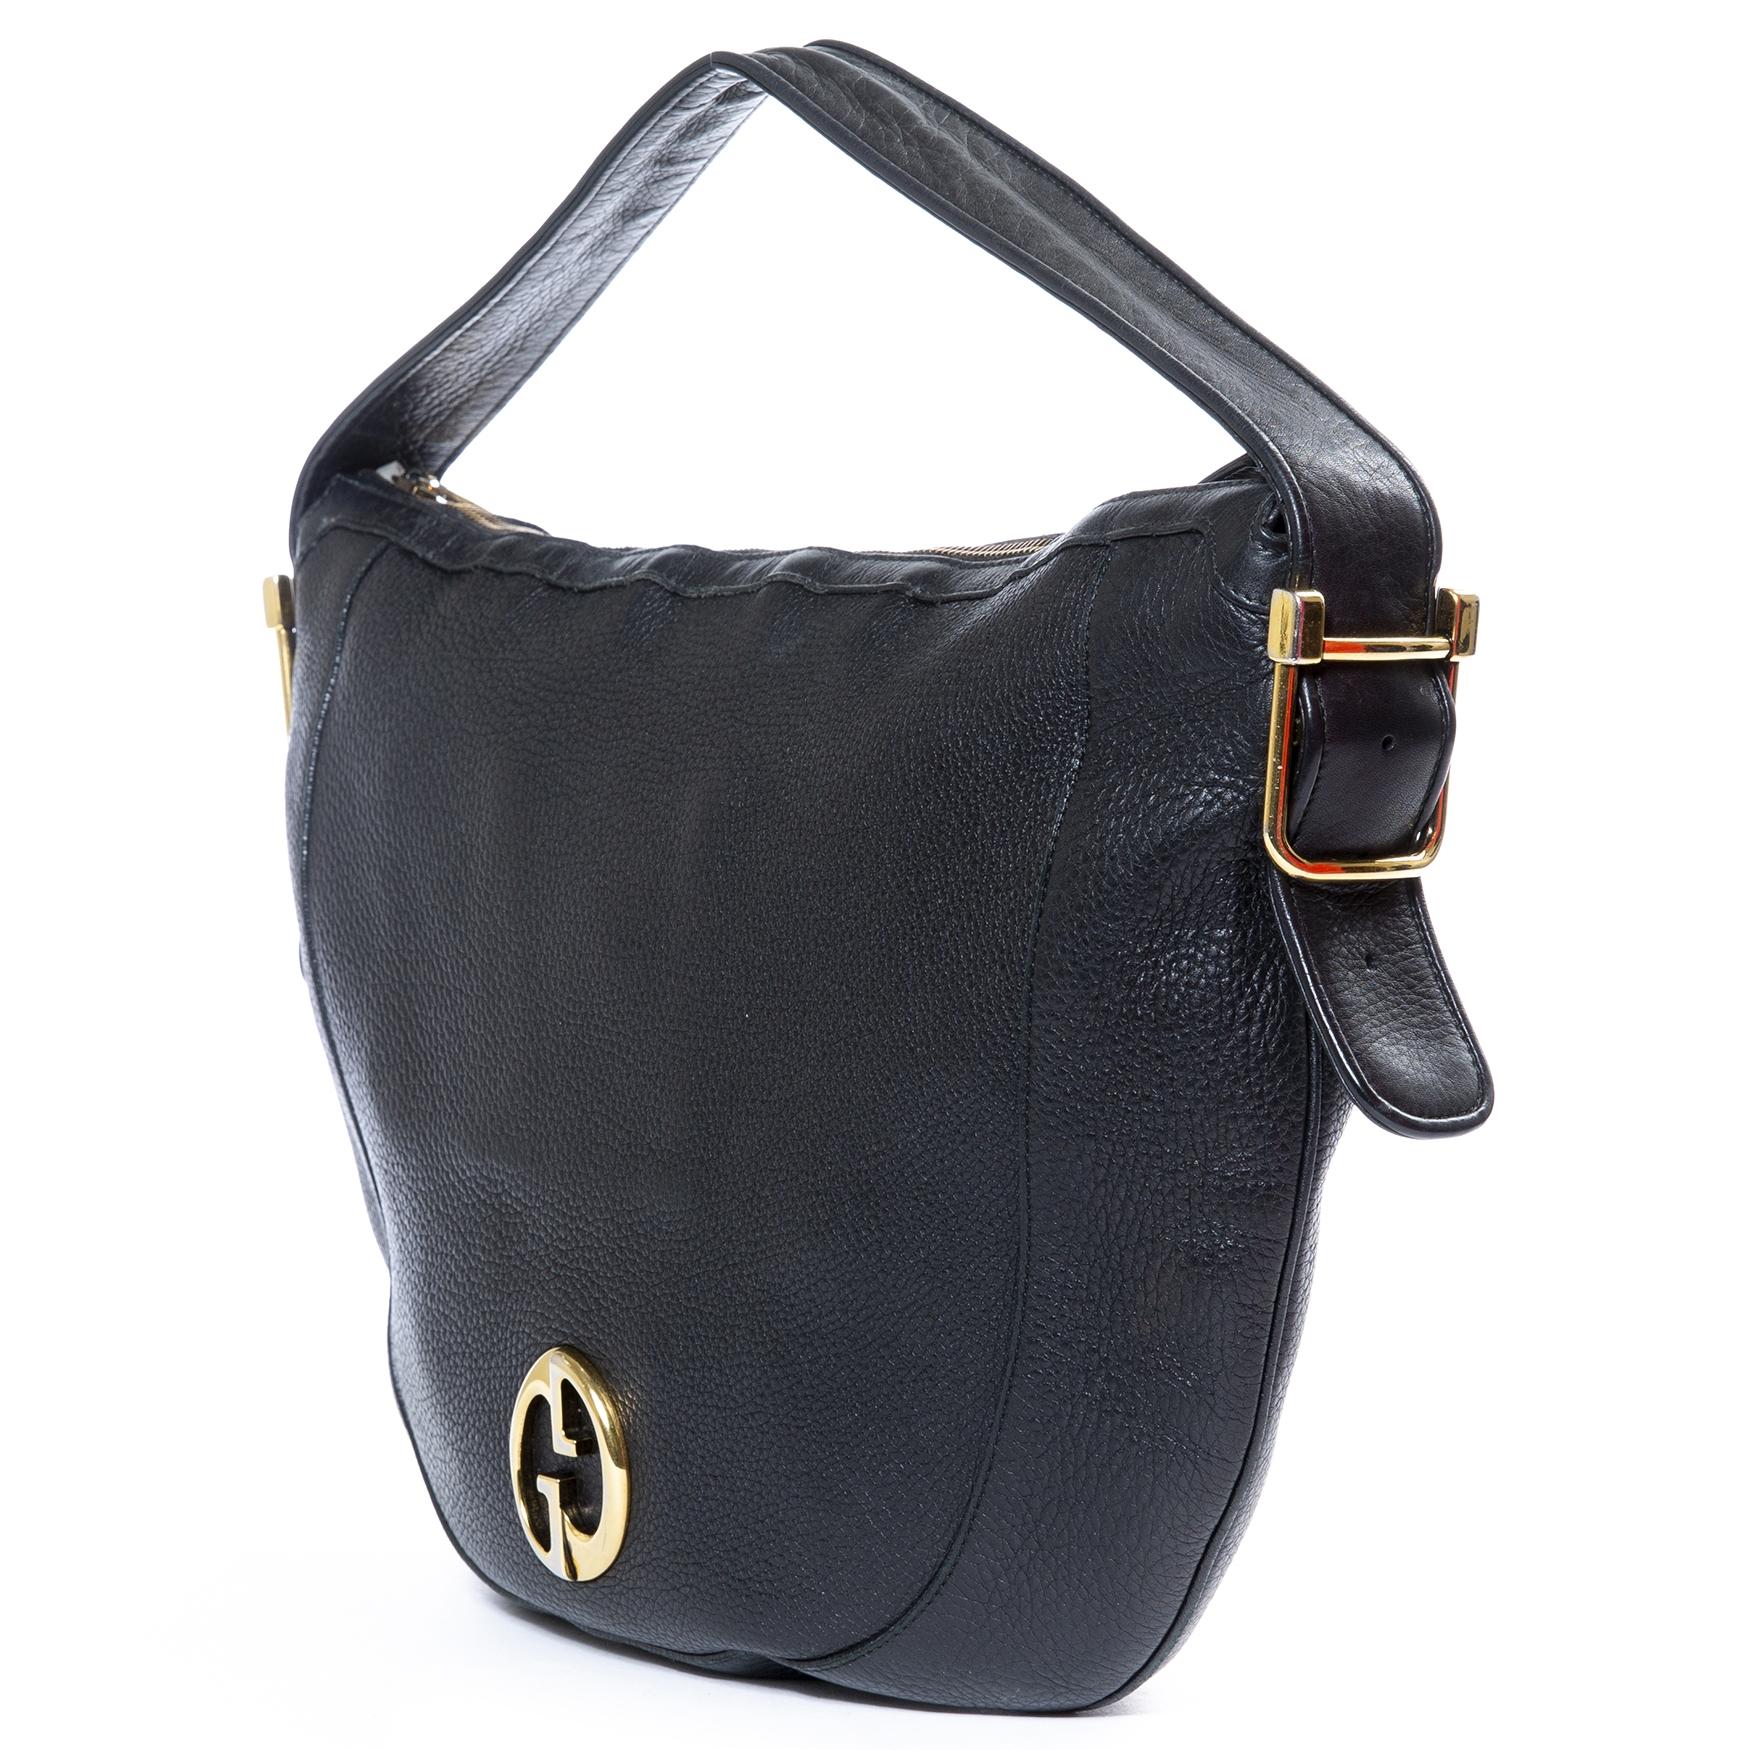 dbe907732b45 ... gucci black leather shoulder bag now for sale at labellov vintage  fashion webshop belgium